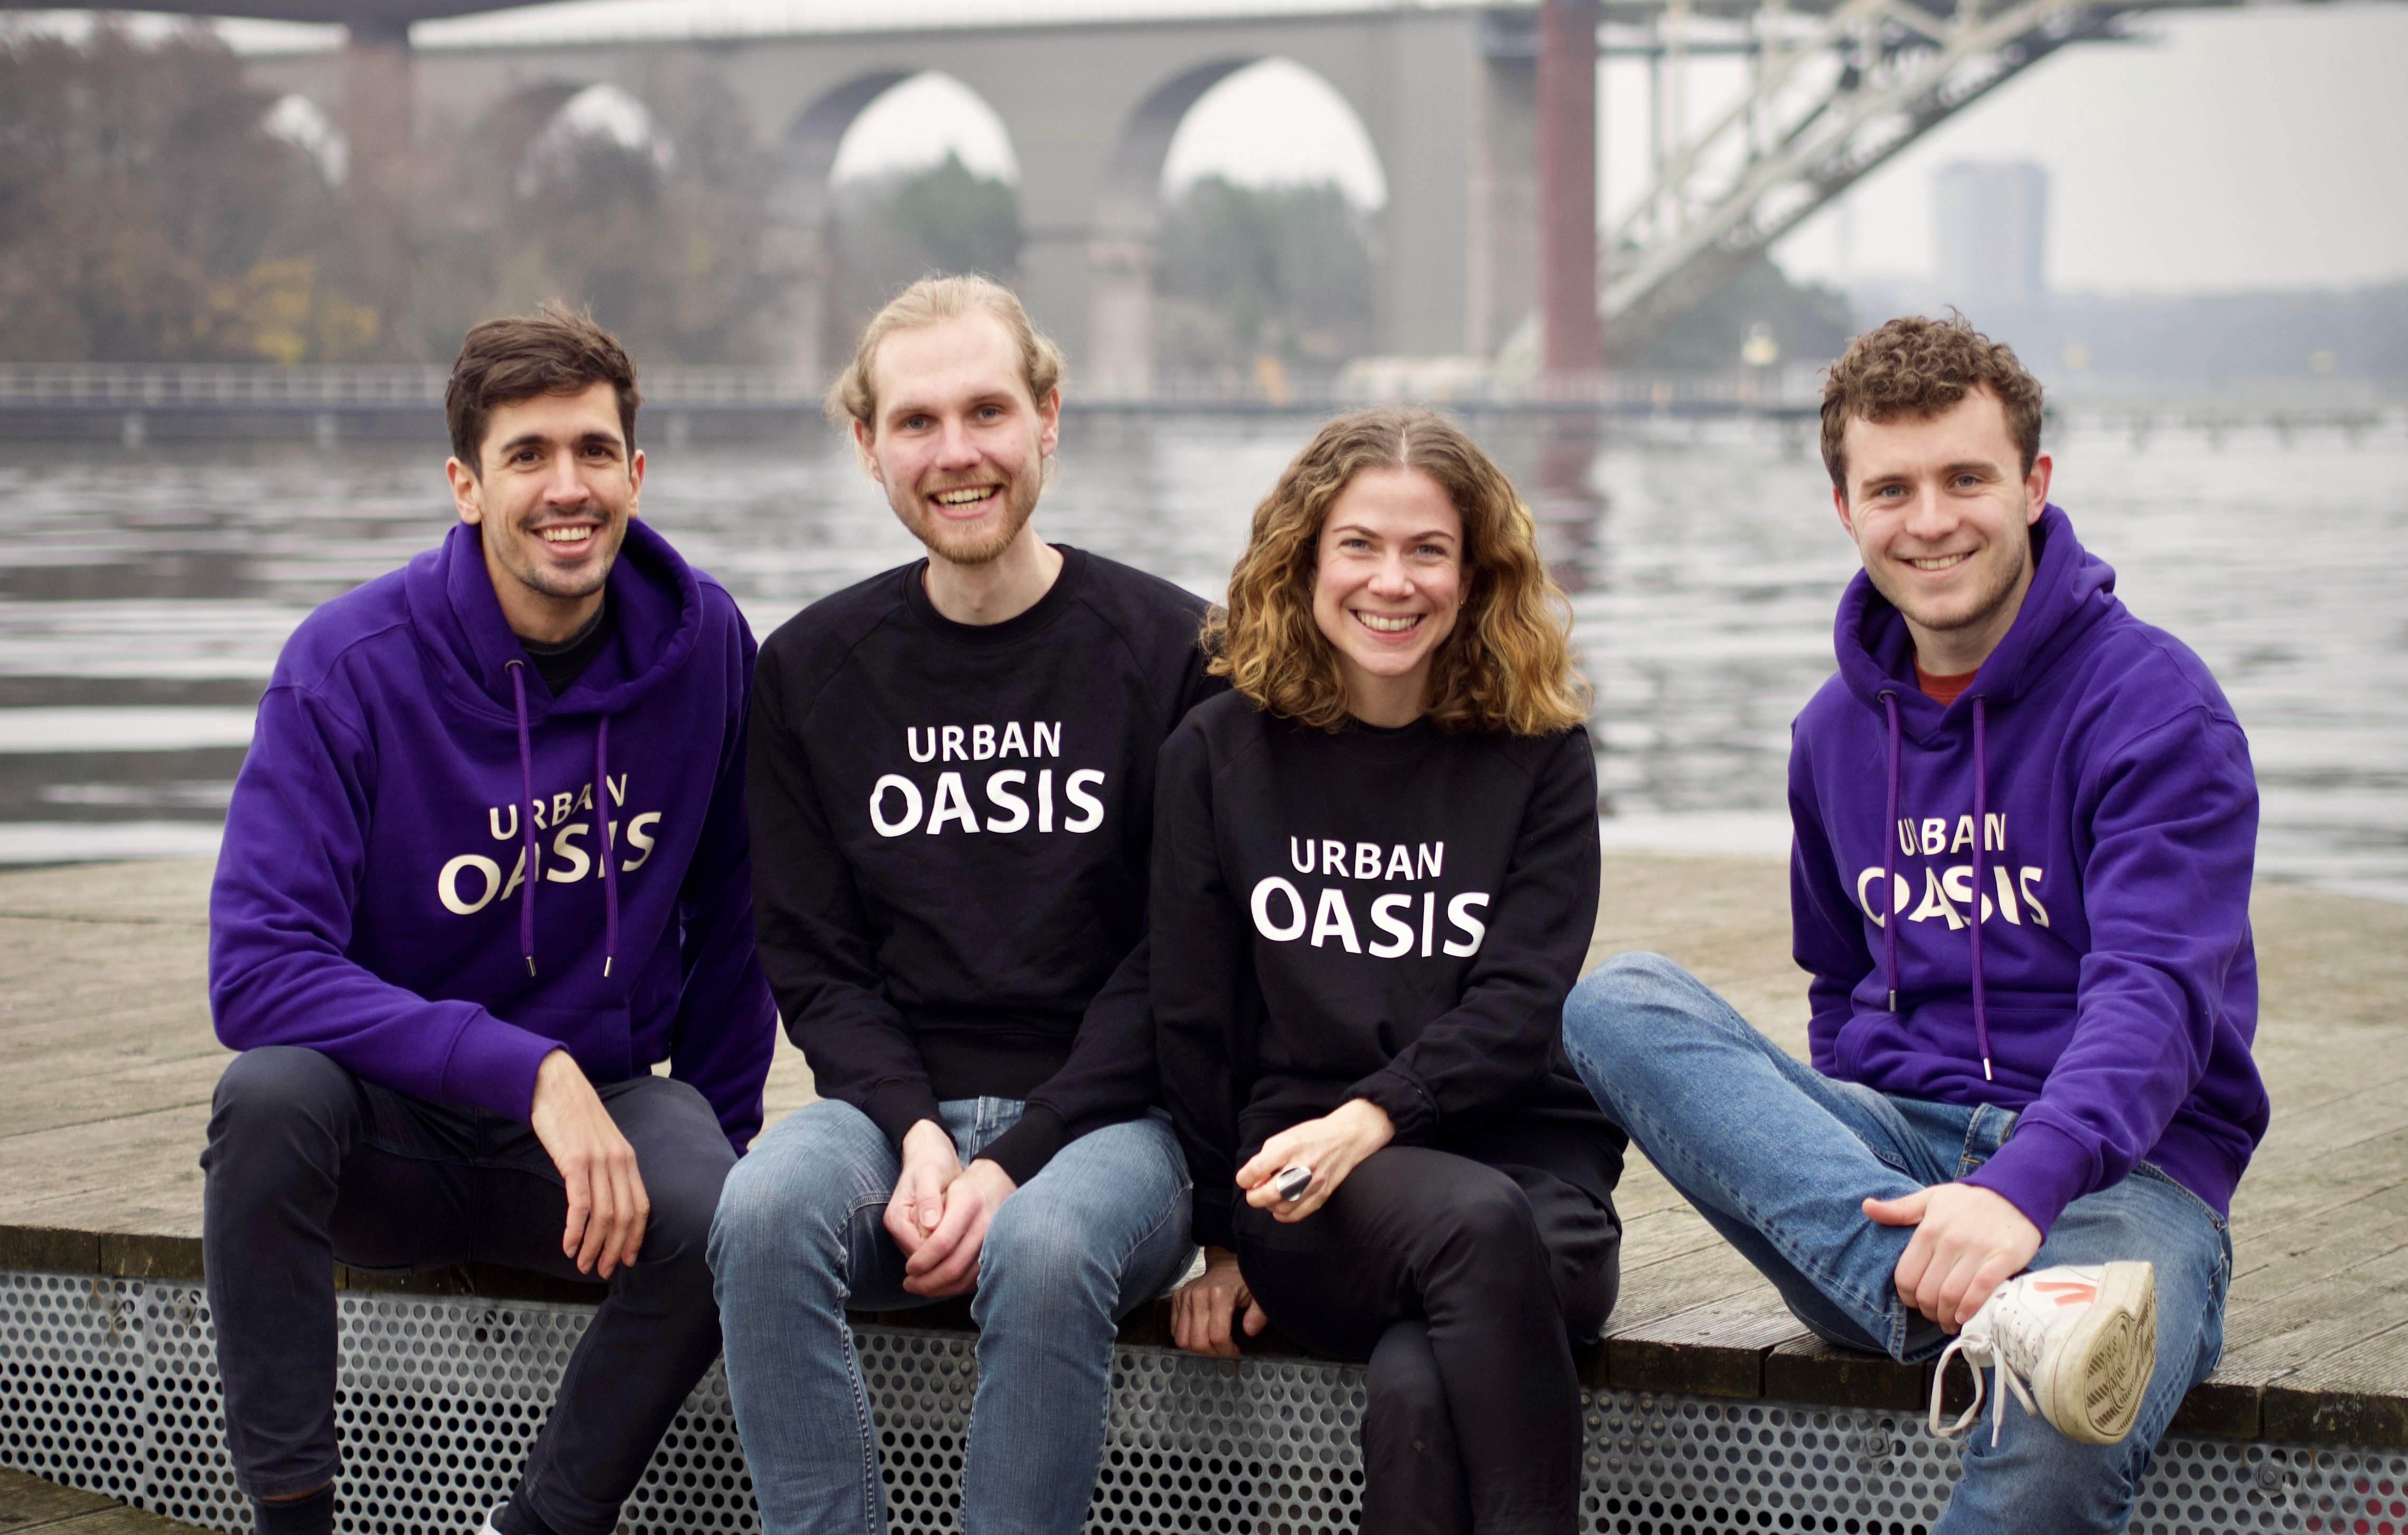 Albert Payaró Llisterri, Lasse Kopiez, Johanna Öhlén Meschke & Lars Bressers core team at Urban Oasis. Photo: Felix Fricke